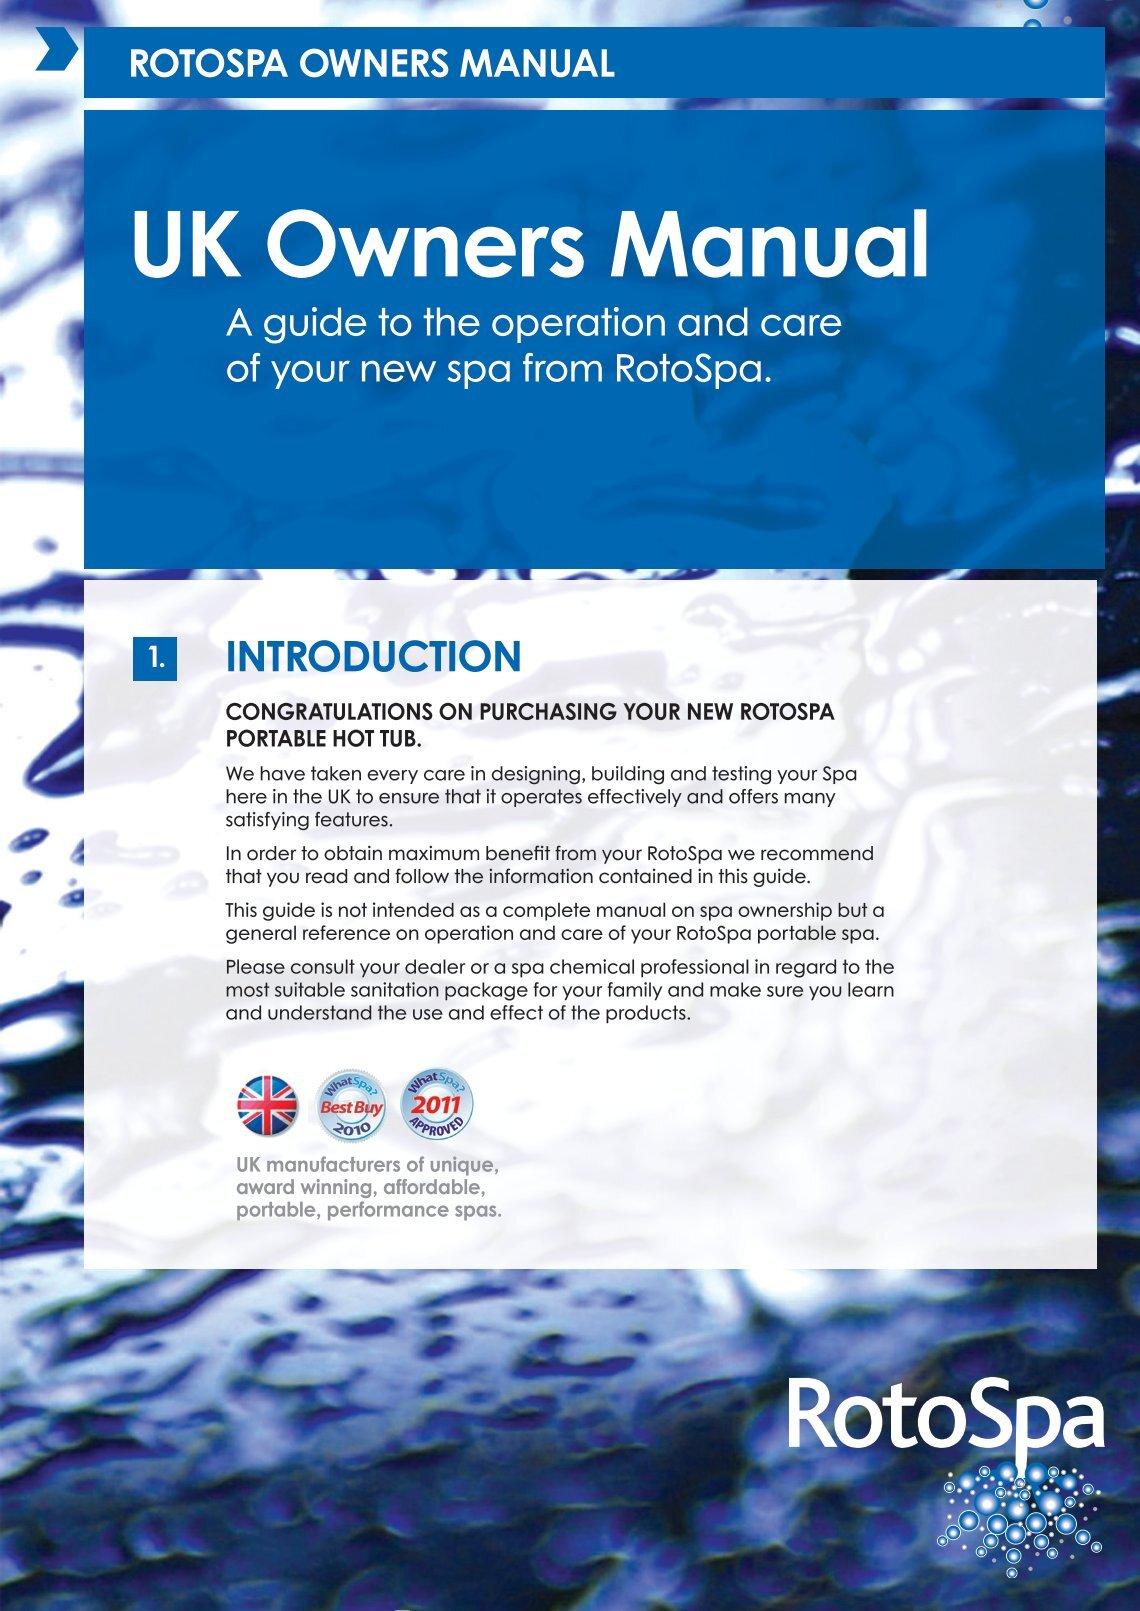 Fuji S3 Manual Ebook Diagram And Parts List For Poulan Walkbehindlawnmowerparts Model Array 2003 Hyundai Xg350 Download 9233 Rh Usoni